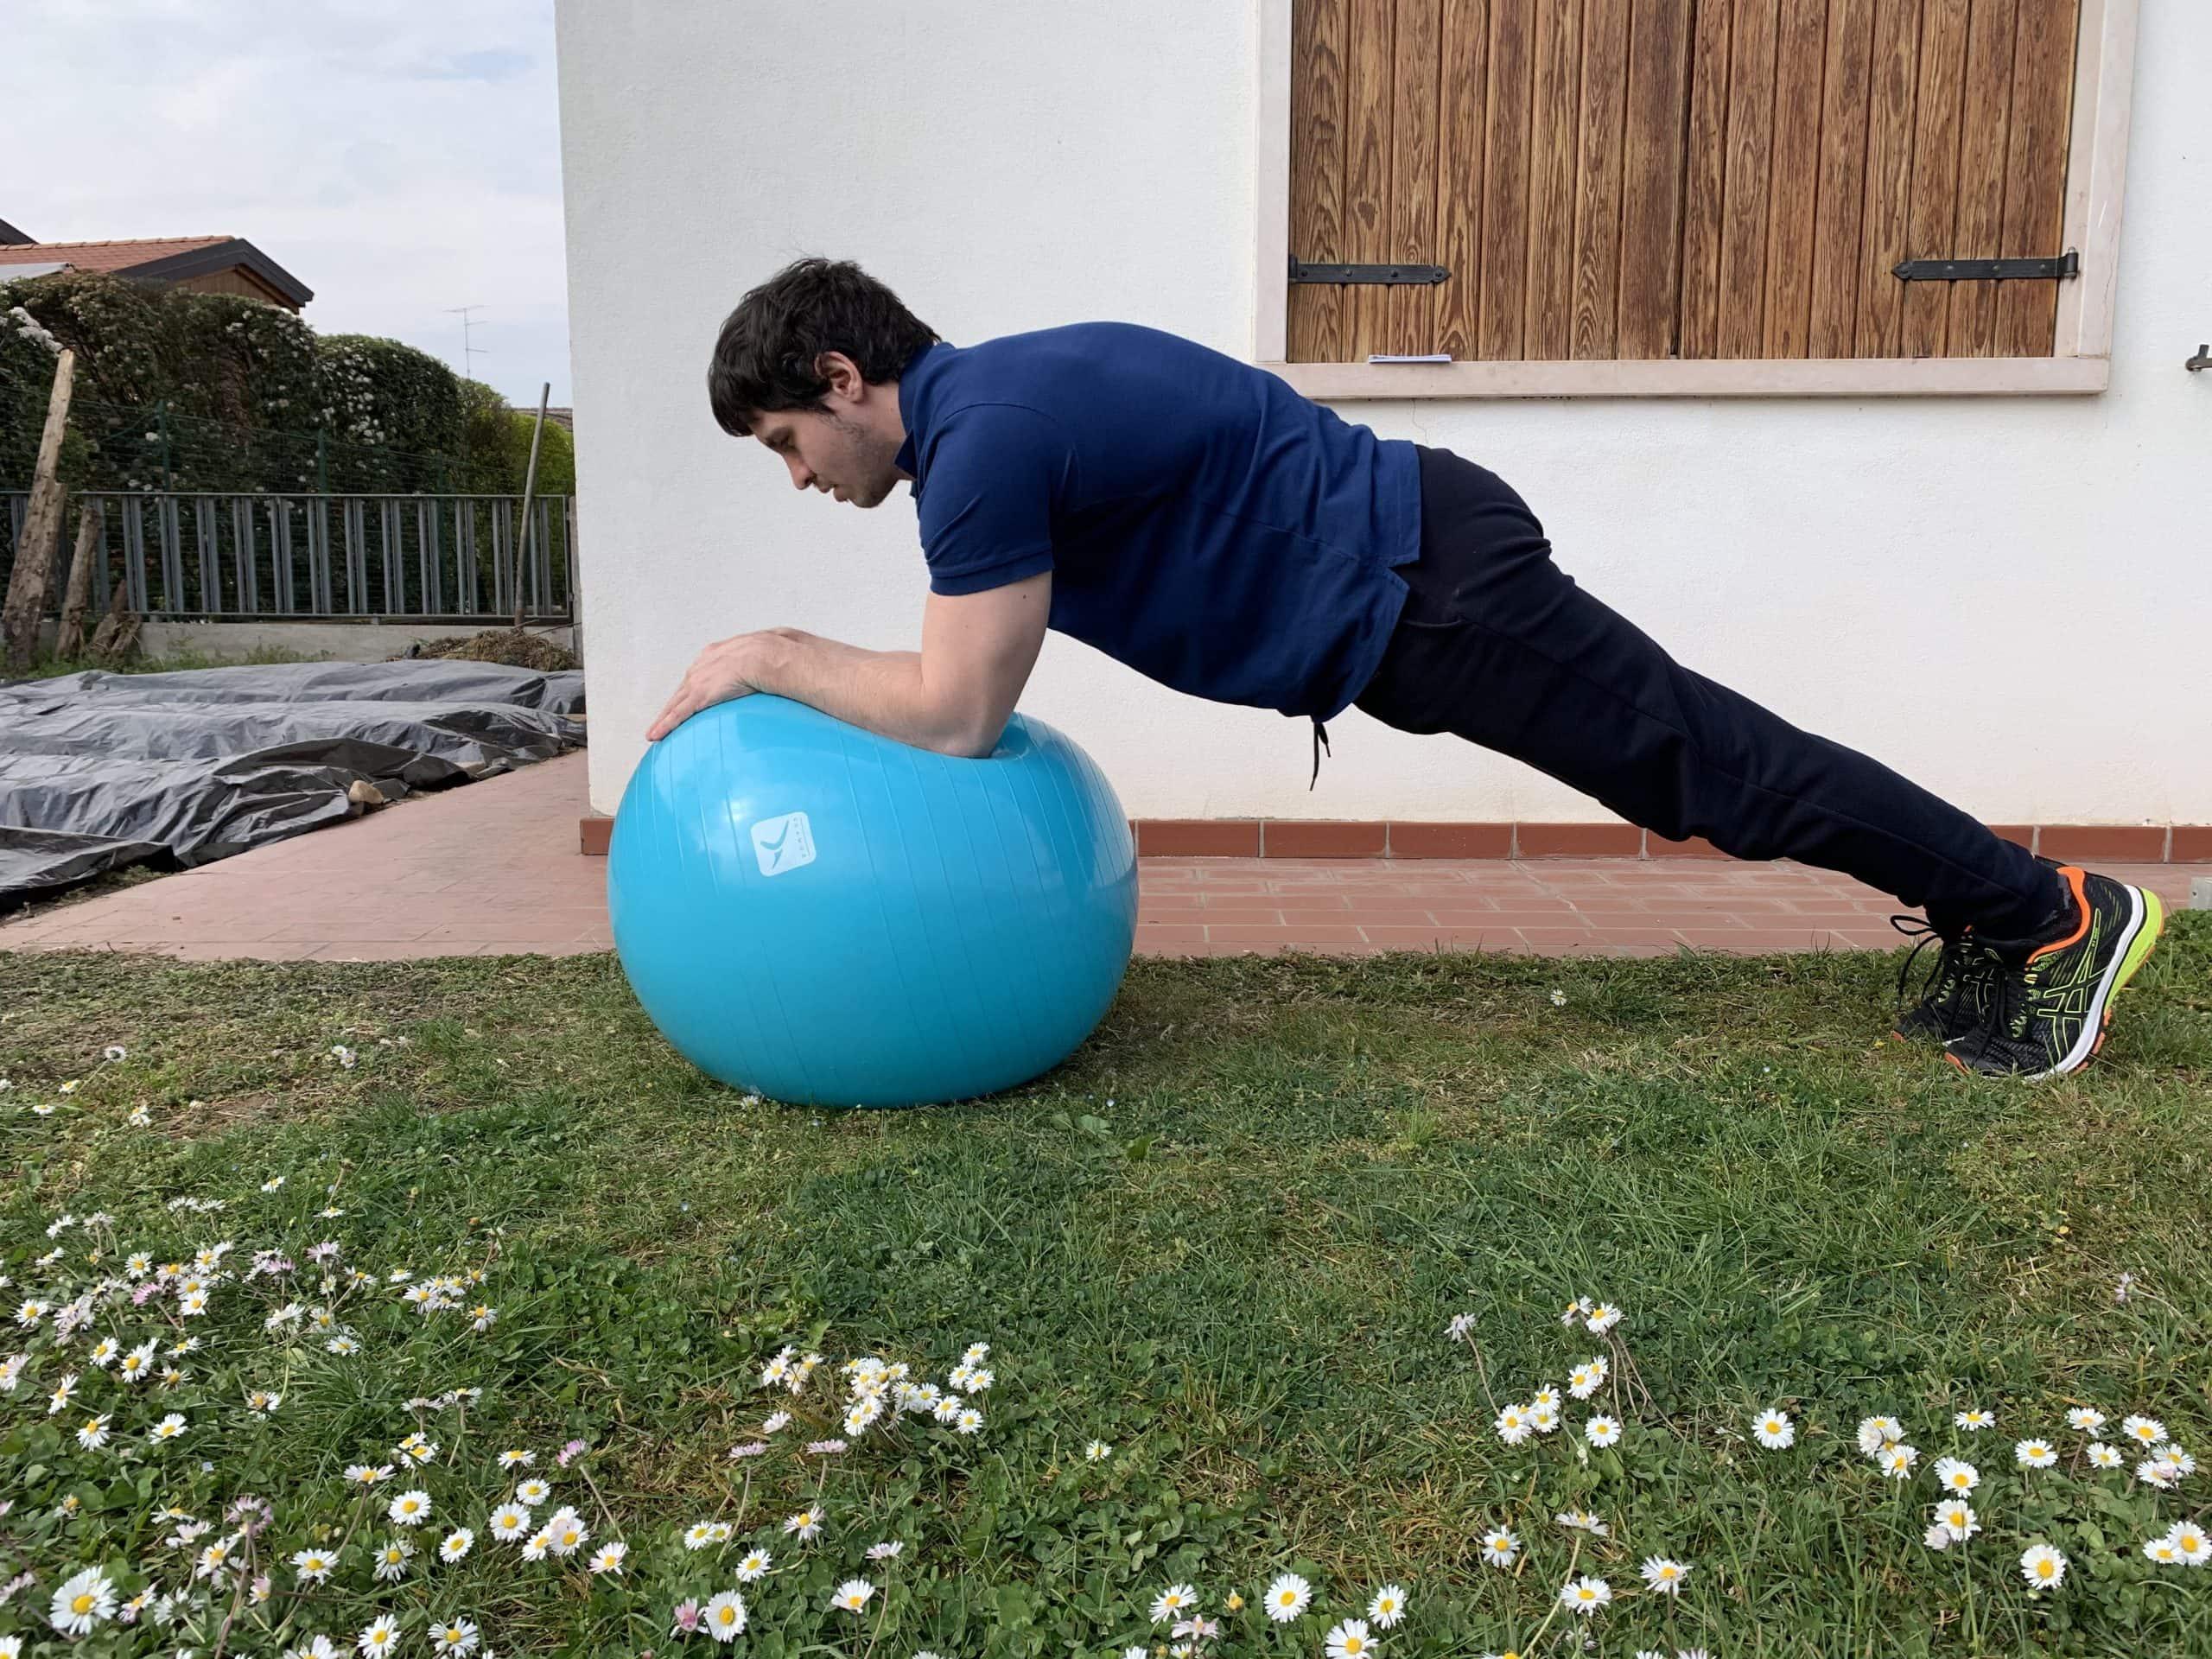 Alessandro Mainente esegue un plank sulla swissball